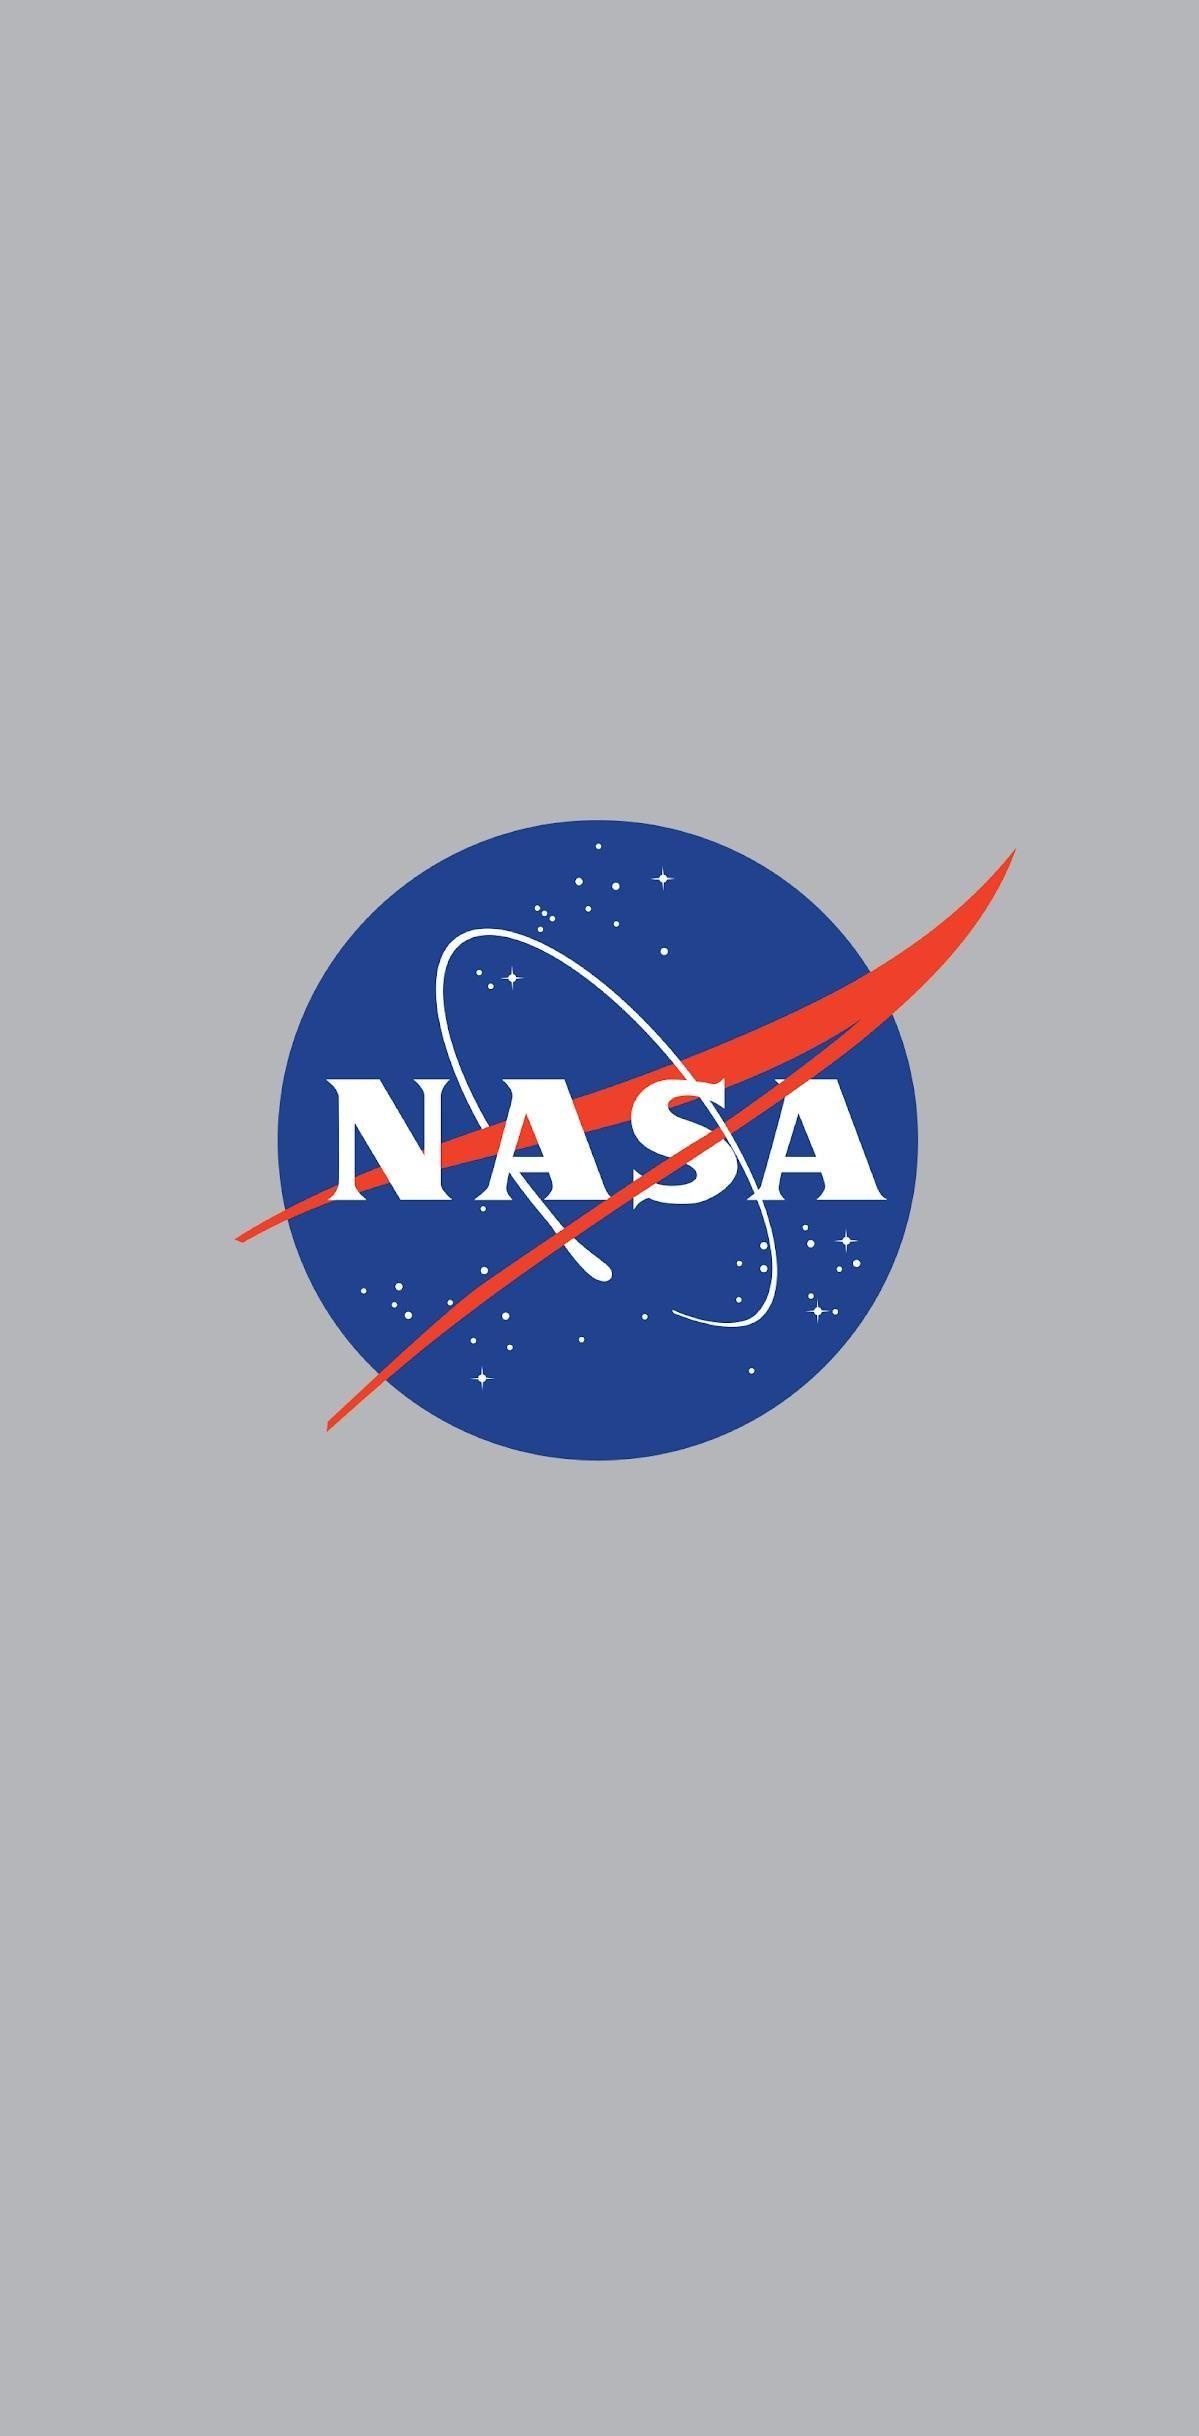 NASA astronaut Lau' Iphone wallpaper nasa, Astronaut